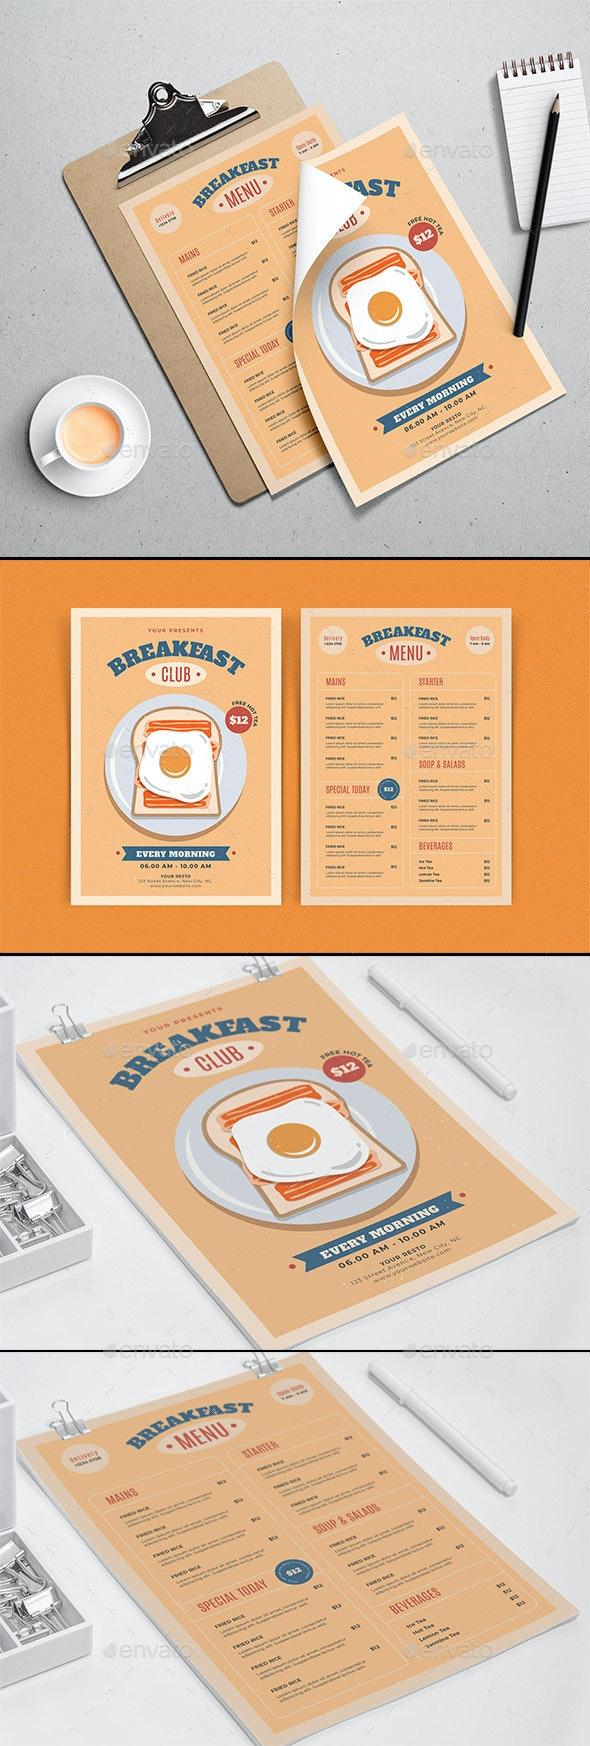 Breakfast Club Flyer Template - Events Flyers